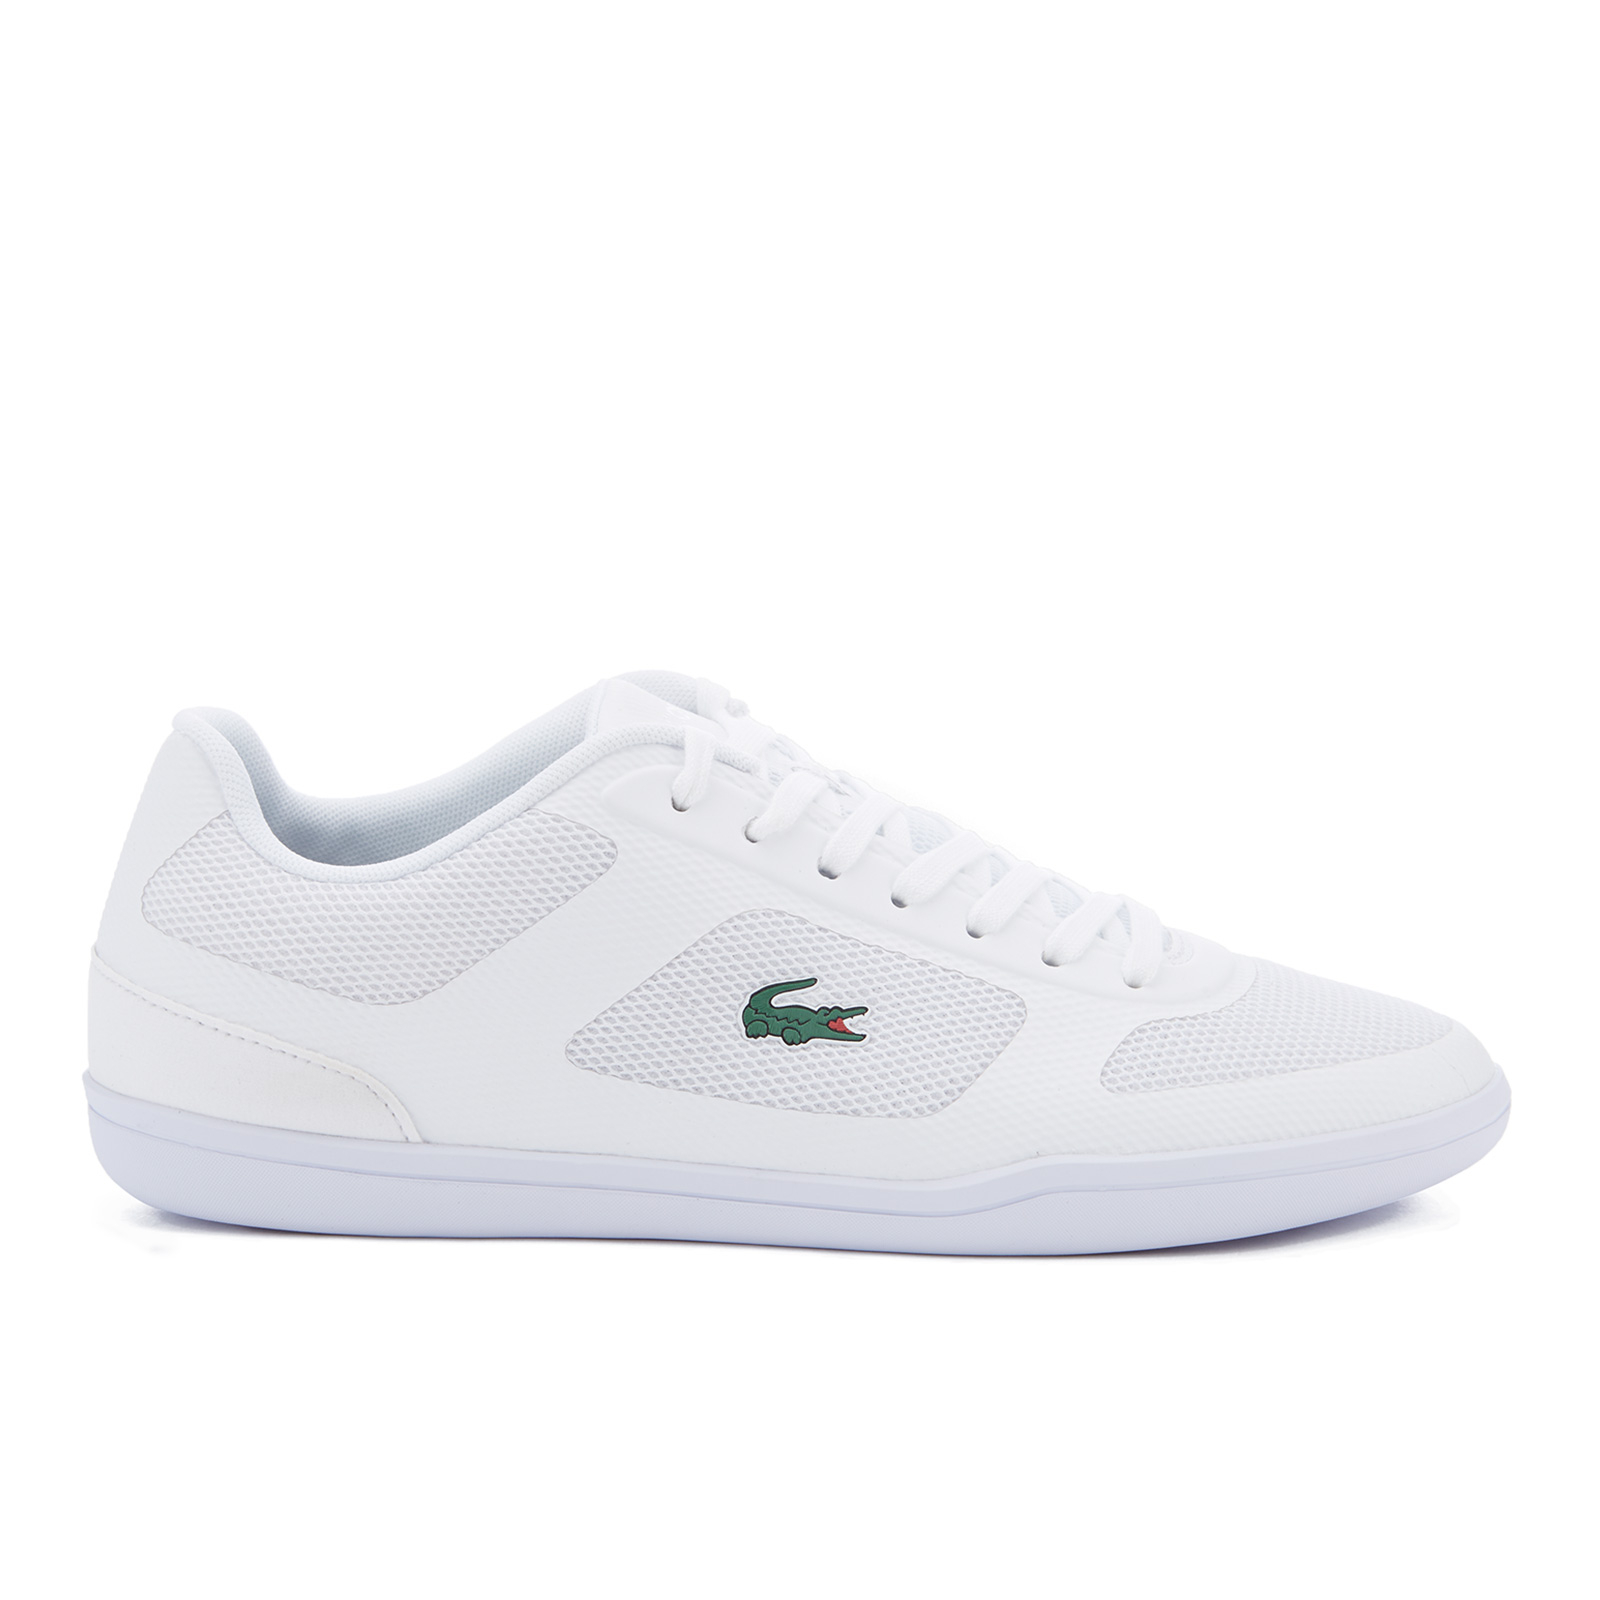 303edd414d38b Lacoste Men s Court-Minimal Sport 316 1 Trainers - White